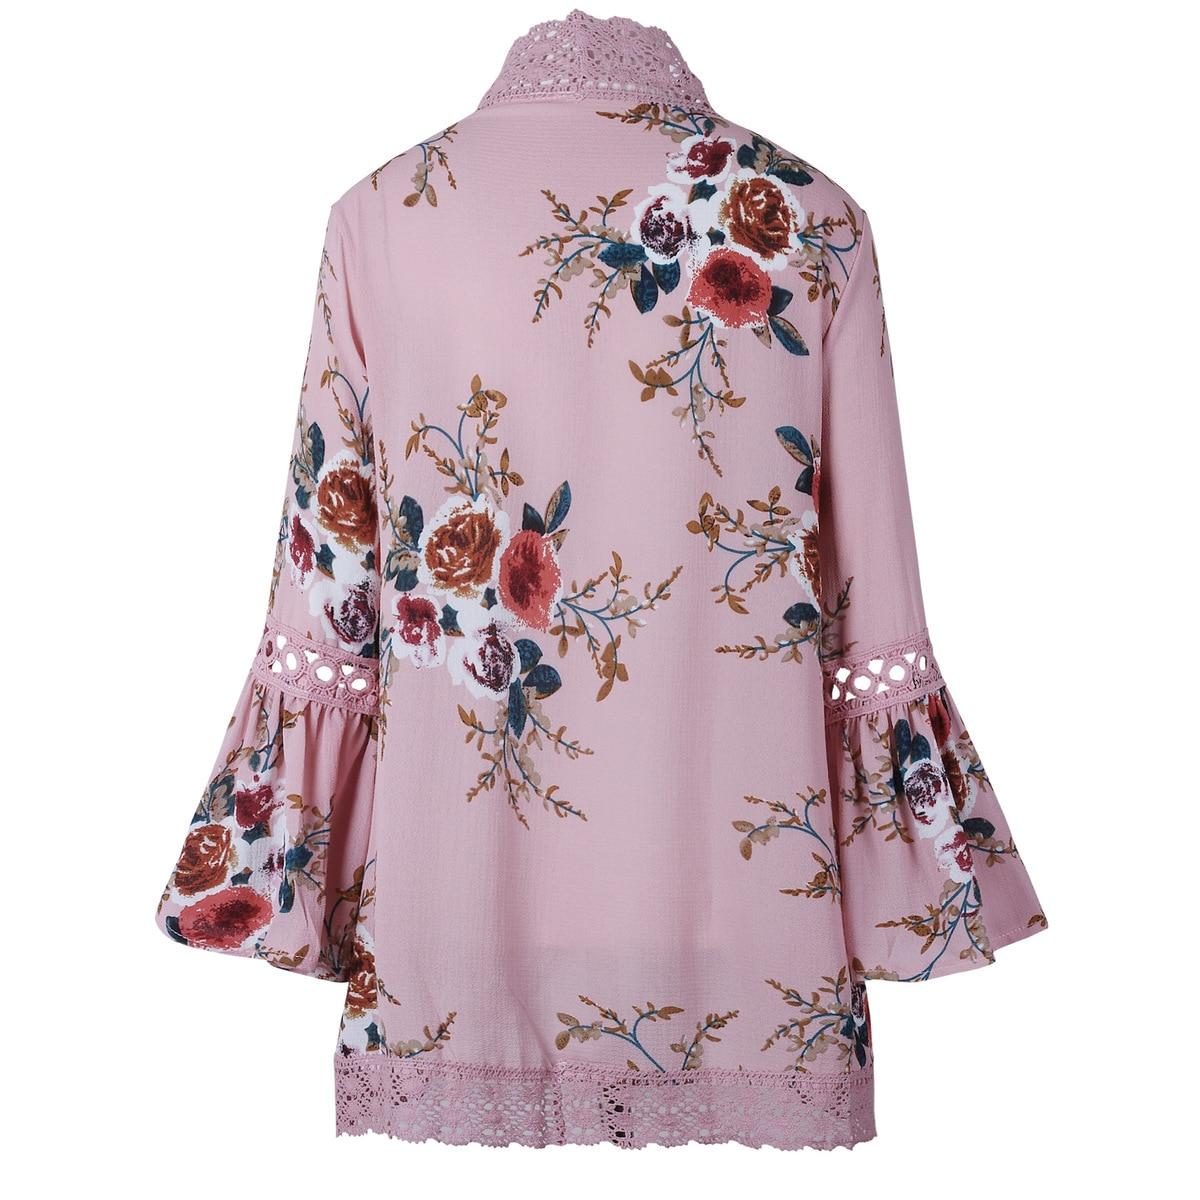 HTB1mV1KEXGWBuNjy0Fbq6z4sXXao Women Plus Size Loose Casual Basic Jackets Female 2018 Autumn Long Flare Sleeve Floral Print Outwear Coat Open Stitch Clothing